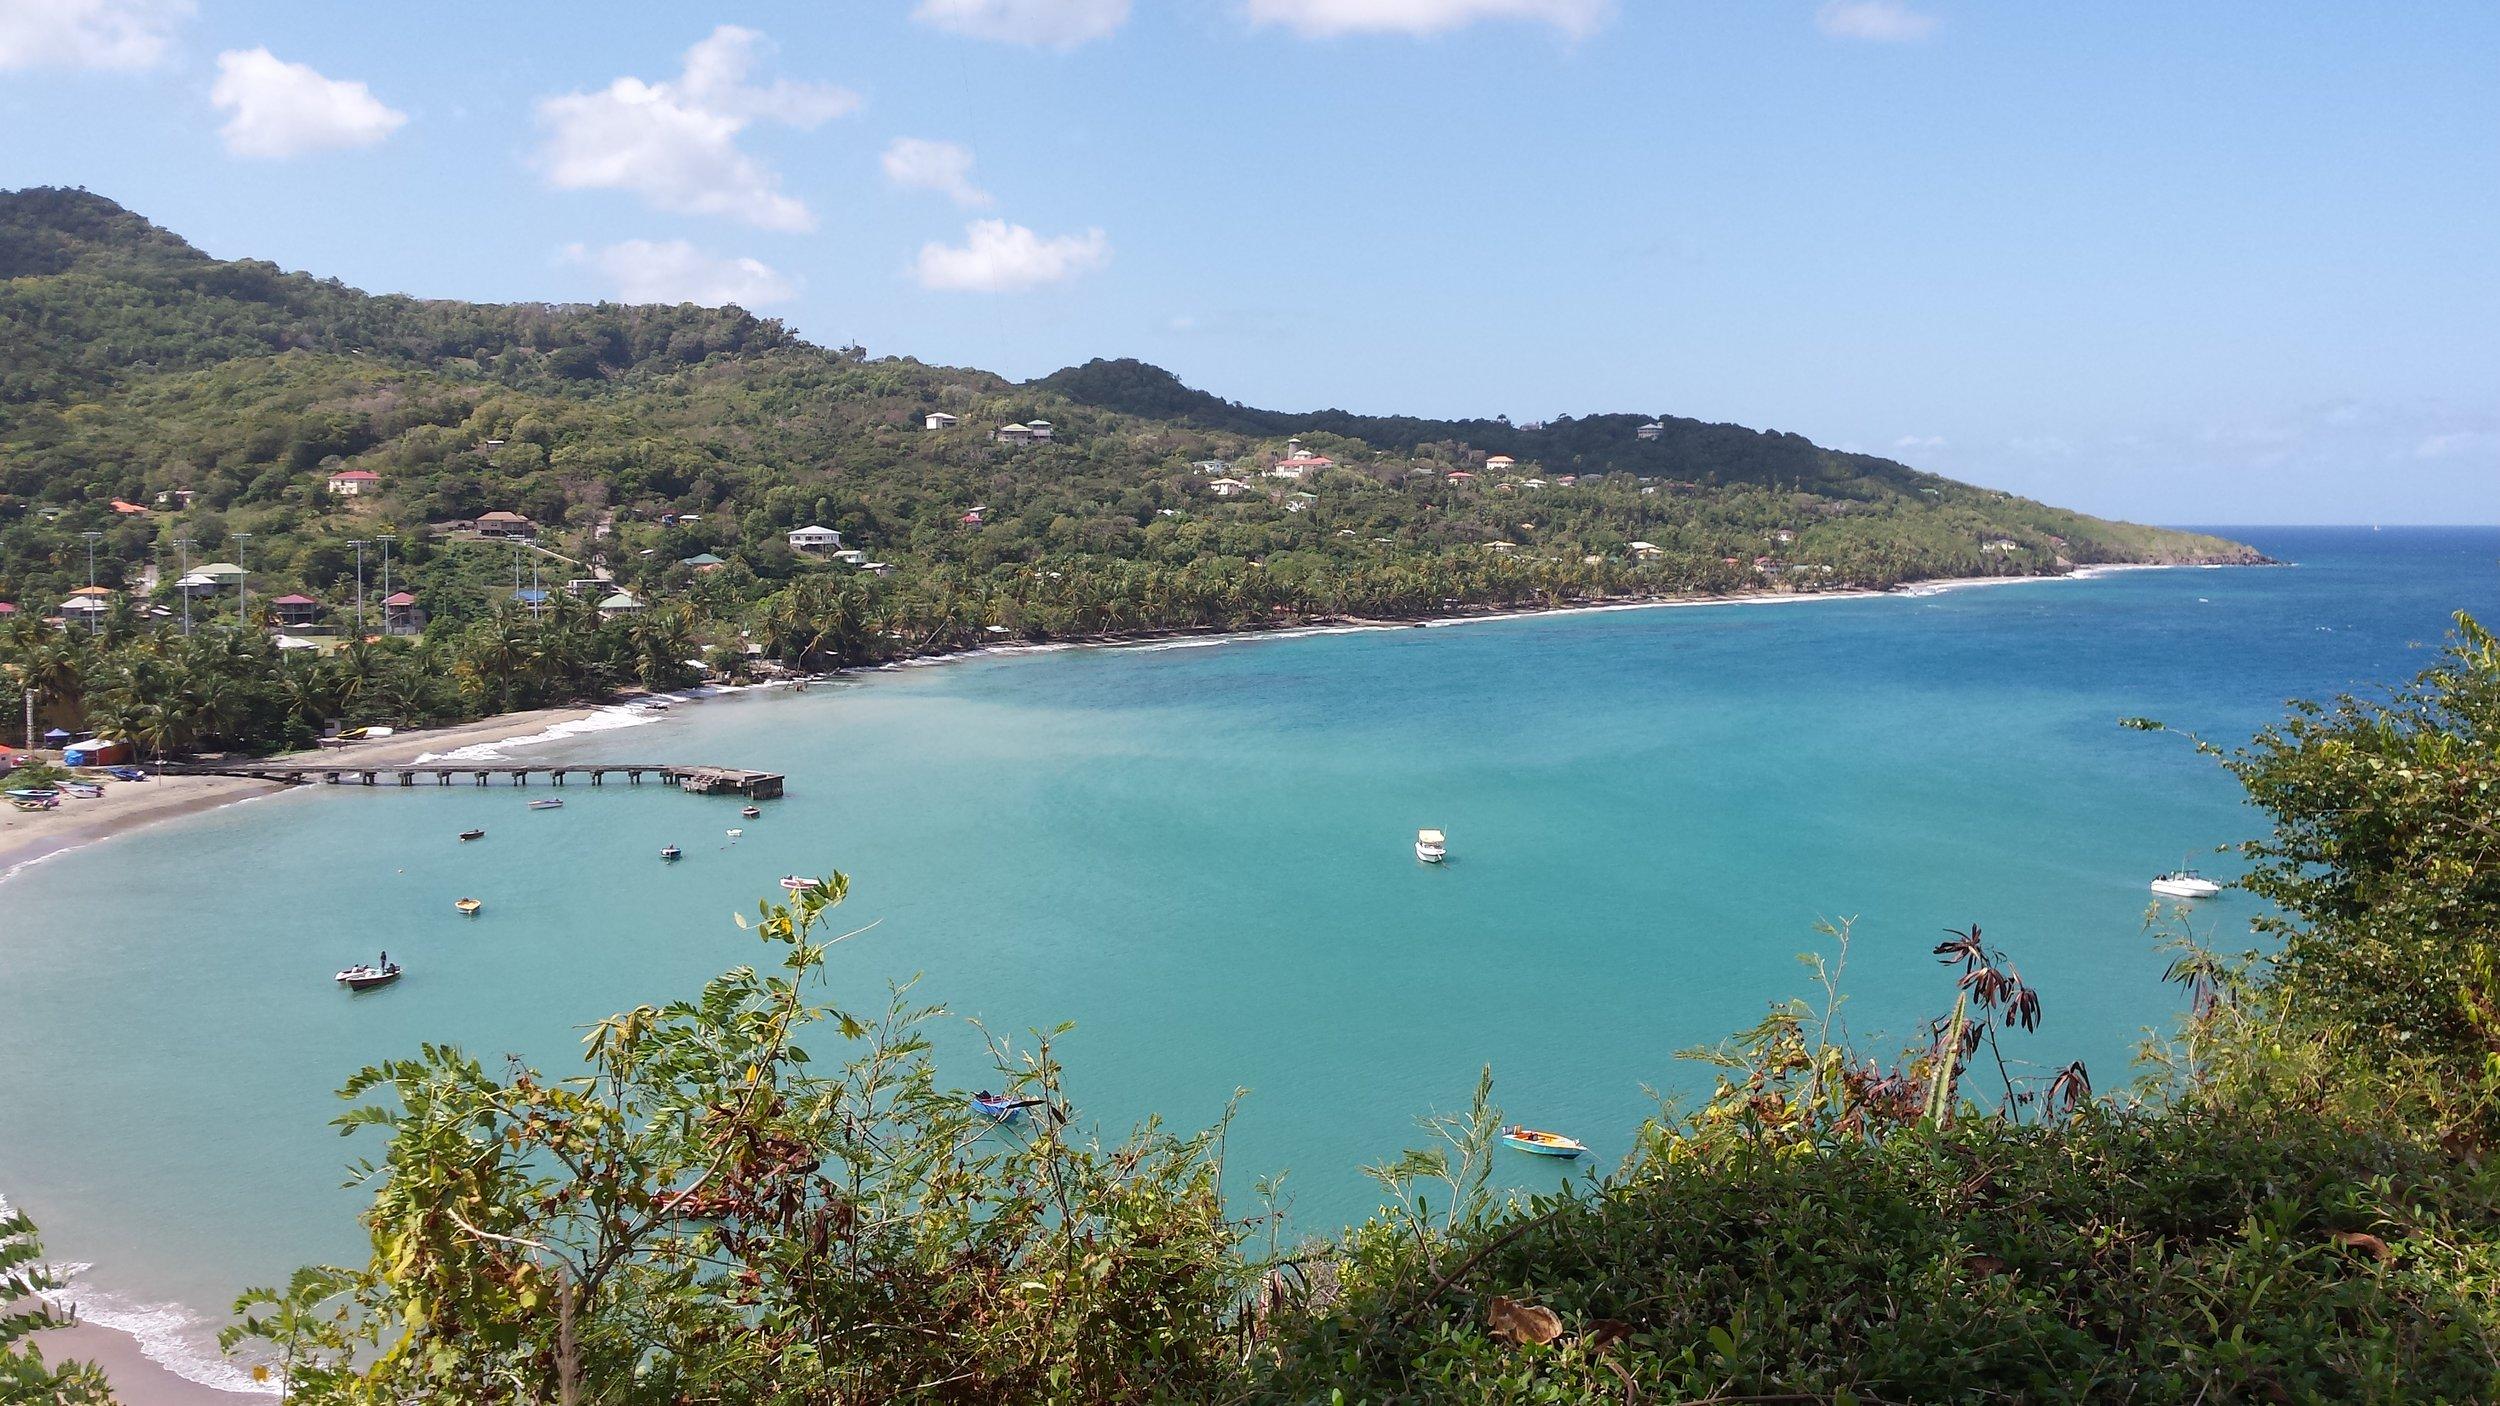 Grenada Bay - January 2019